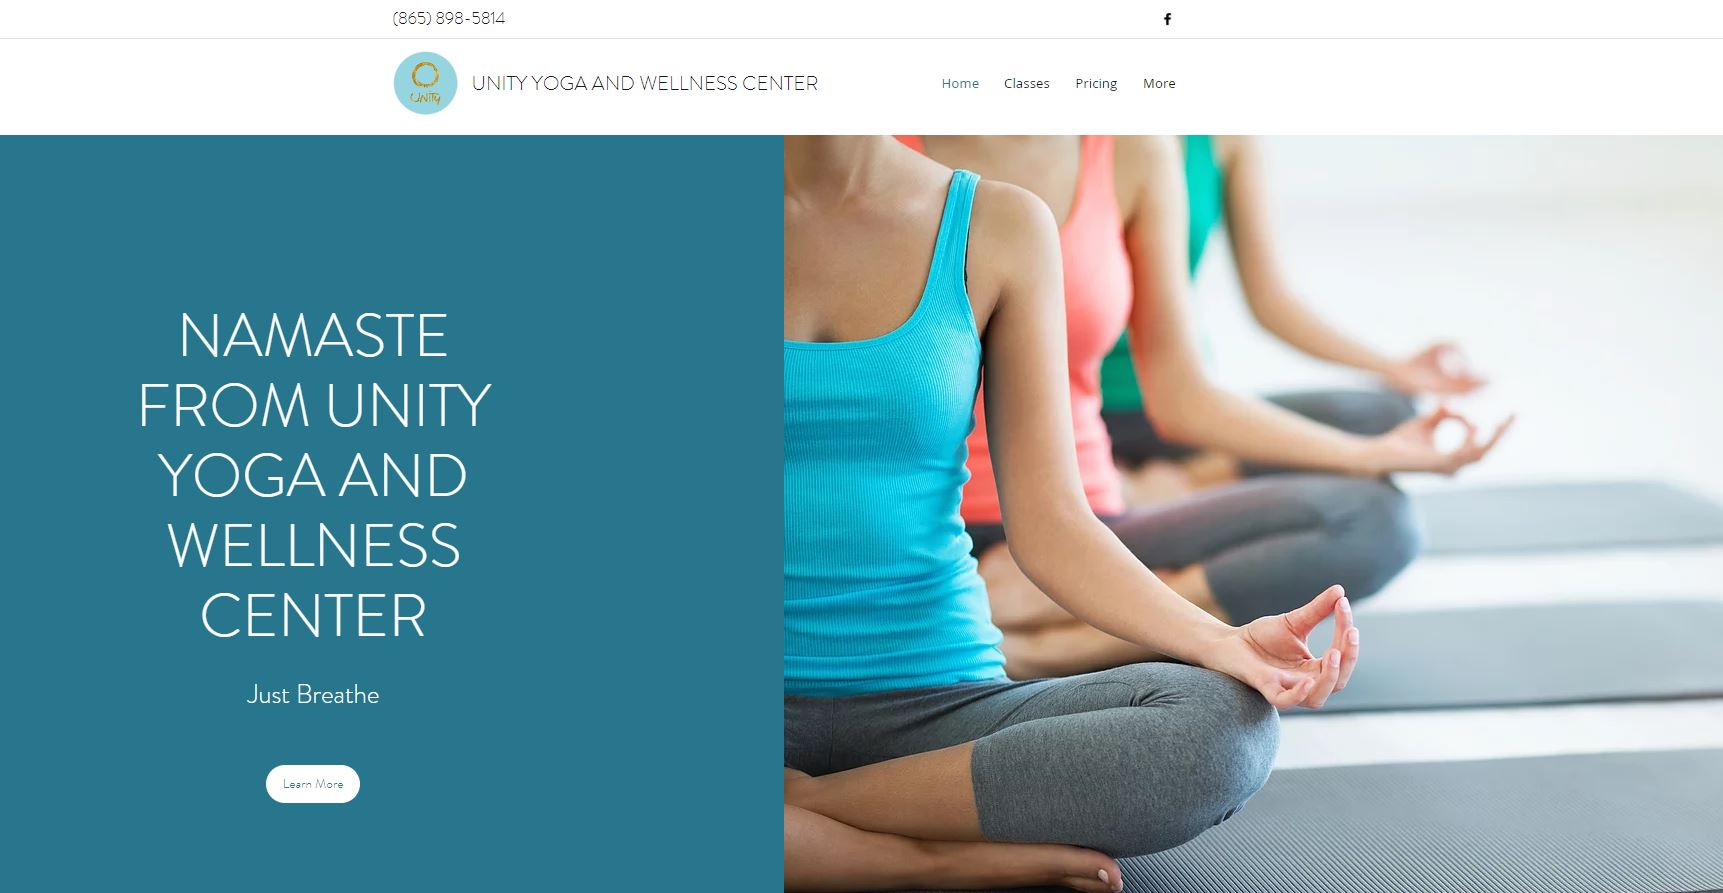 Unity Yoga